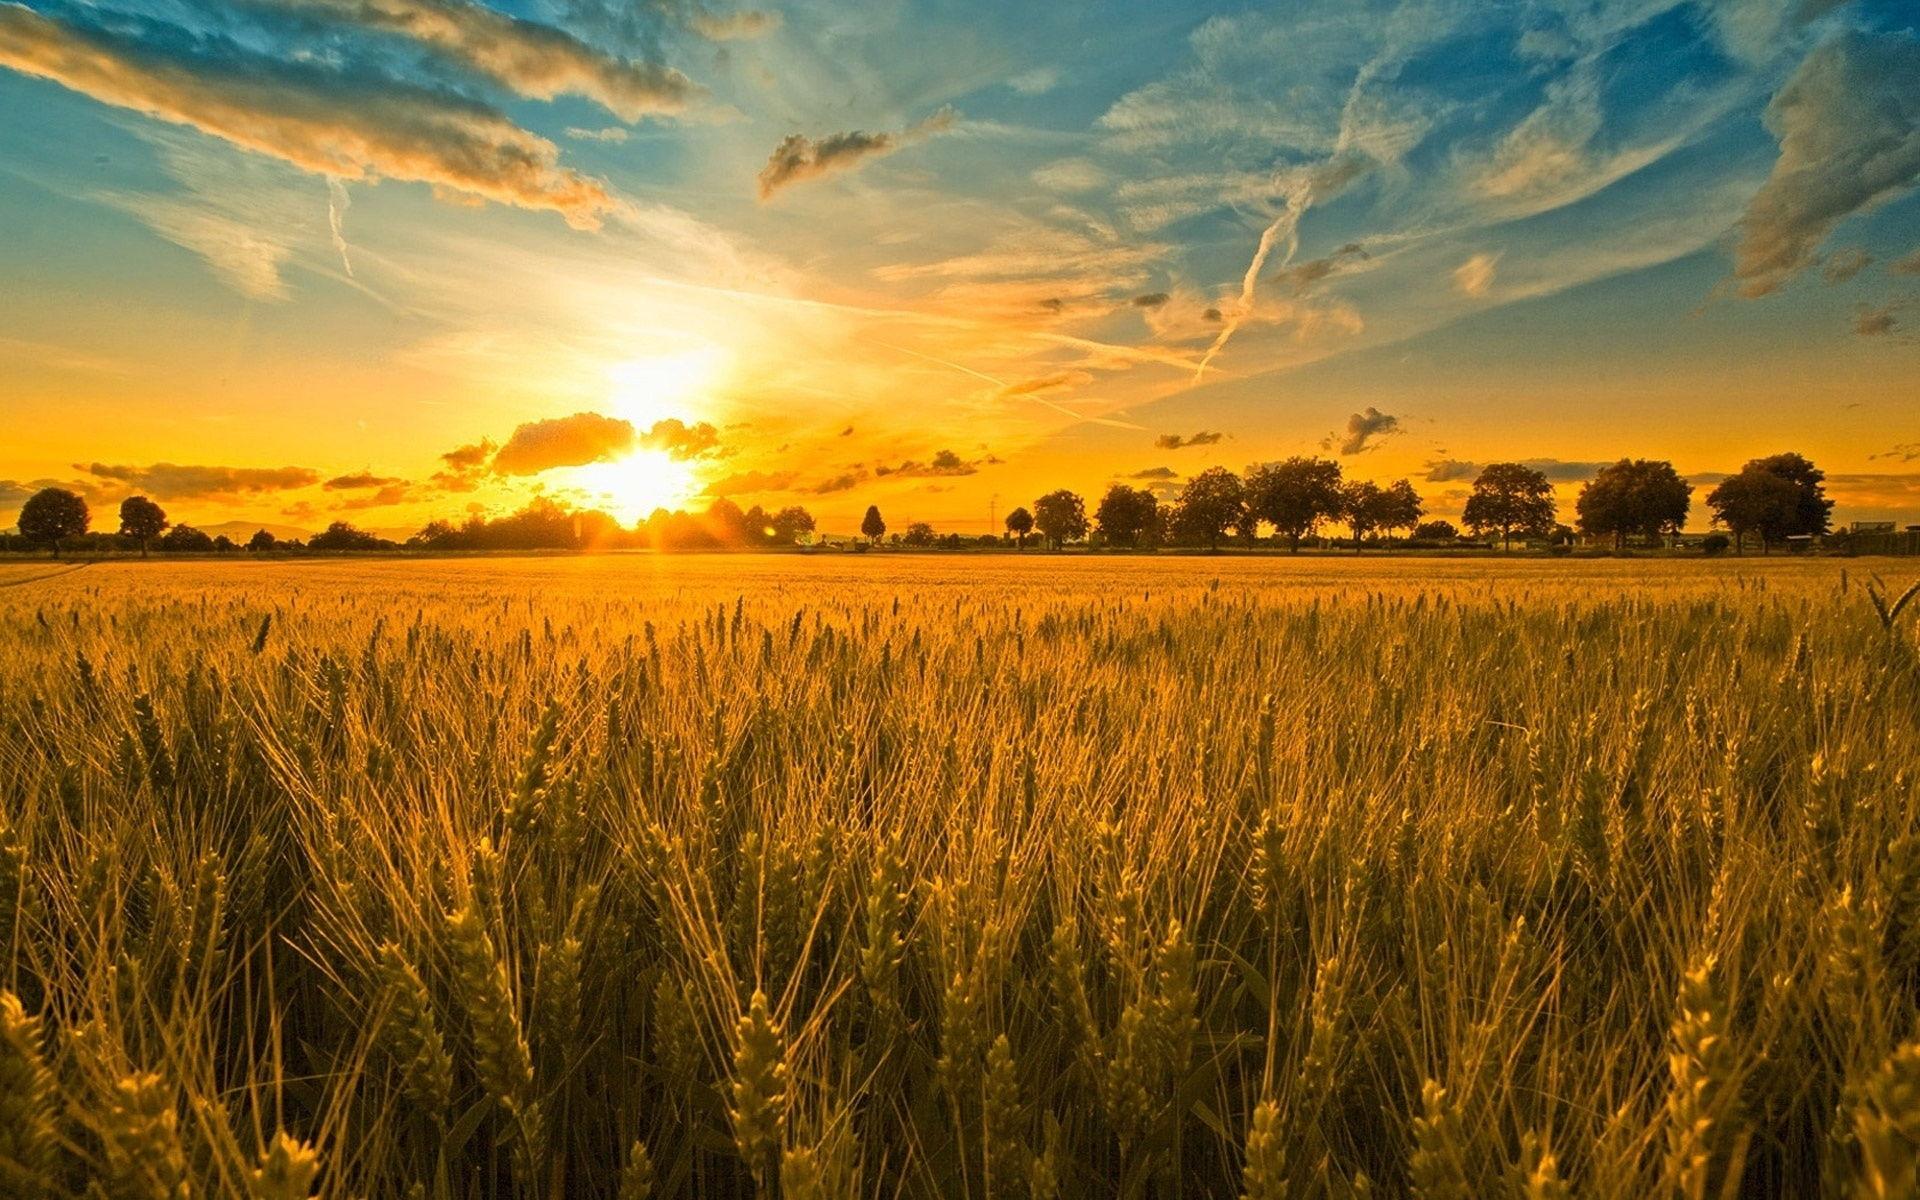 sunset and wheat field wallpaper hd beautiful desktop background 1920x1200